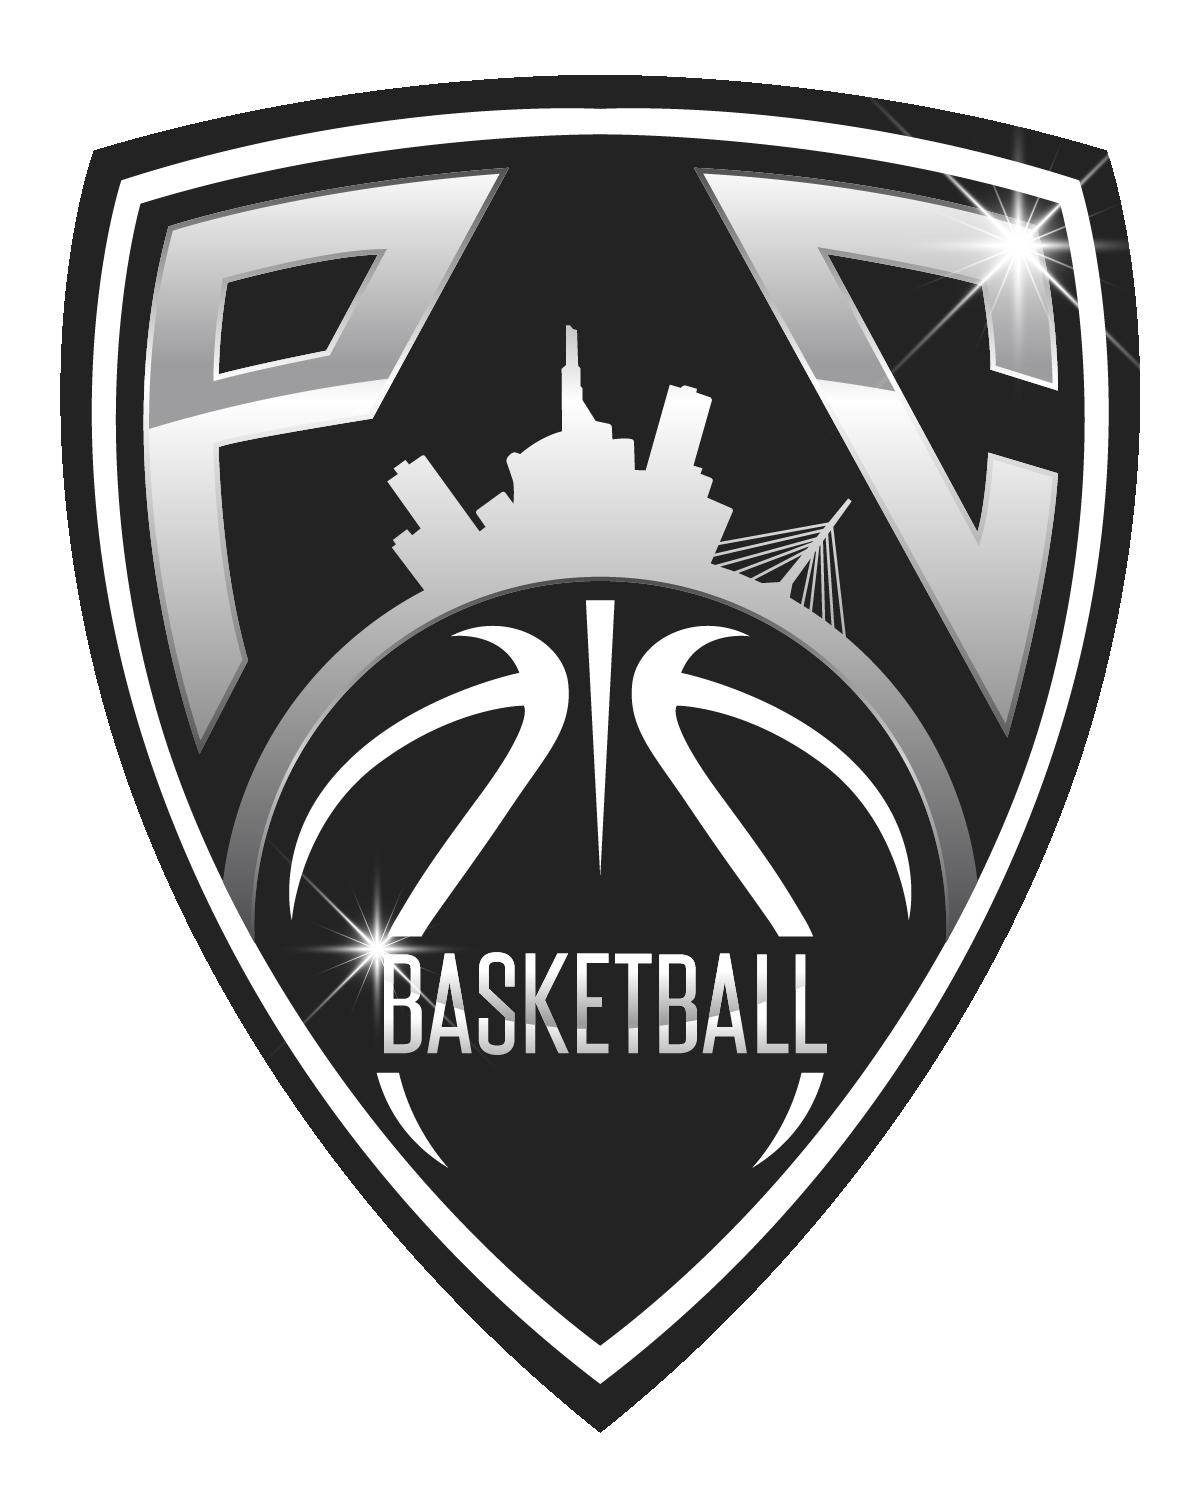 Peg City Basketball Association